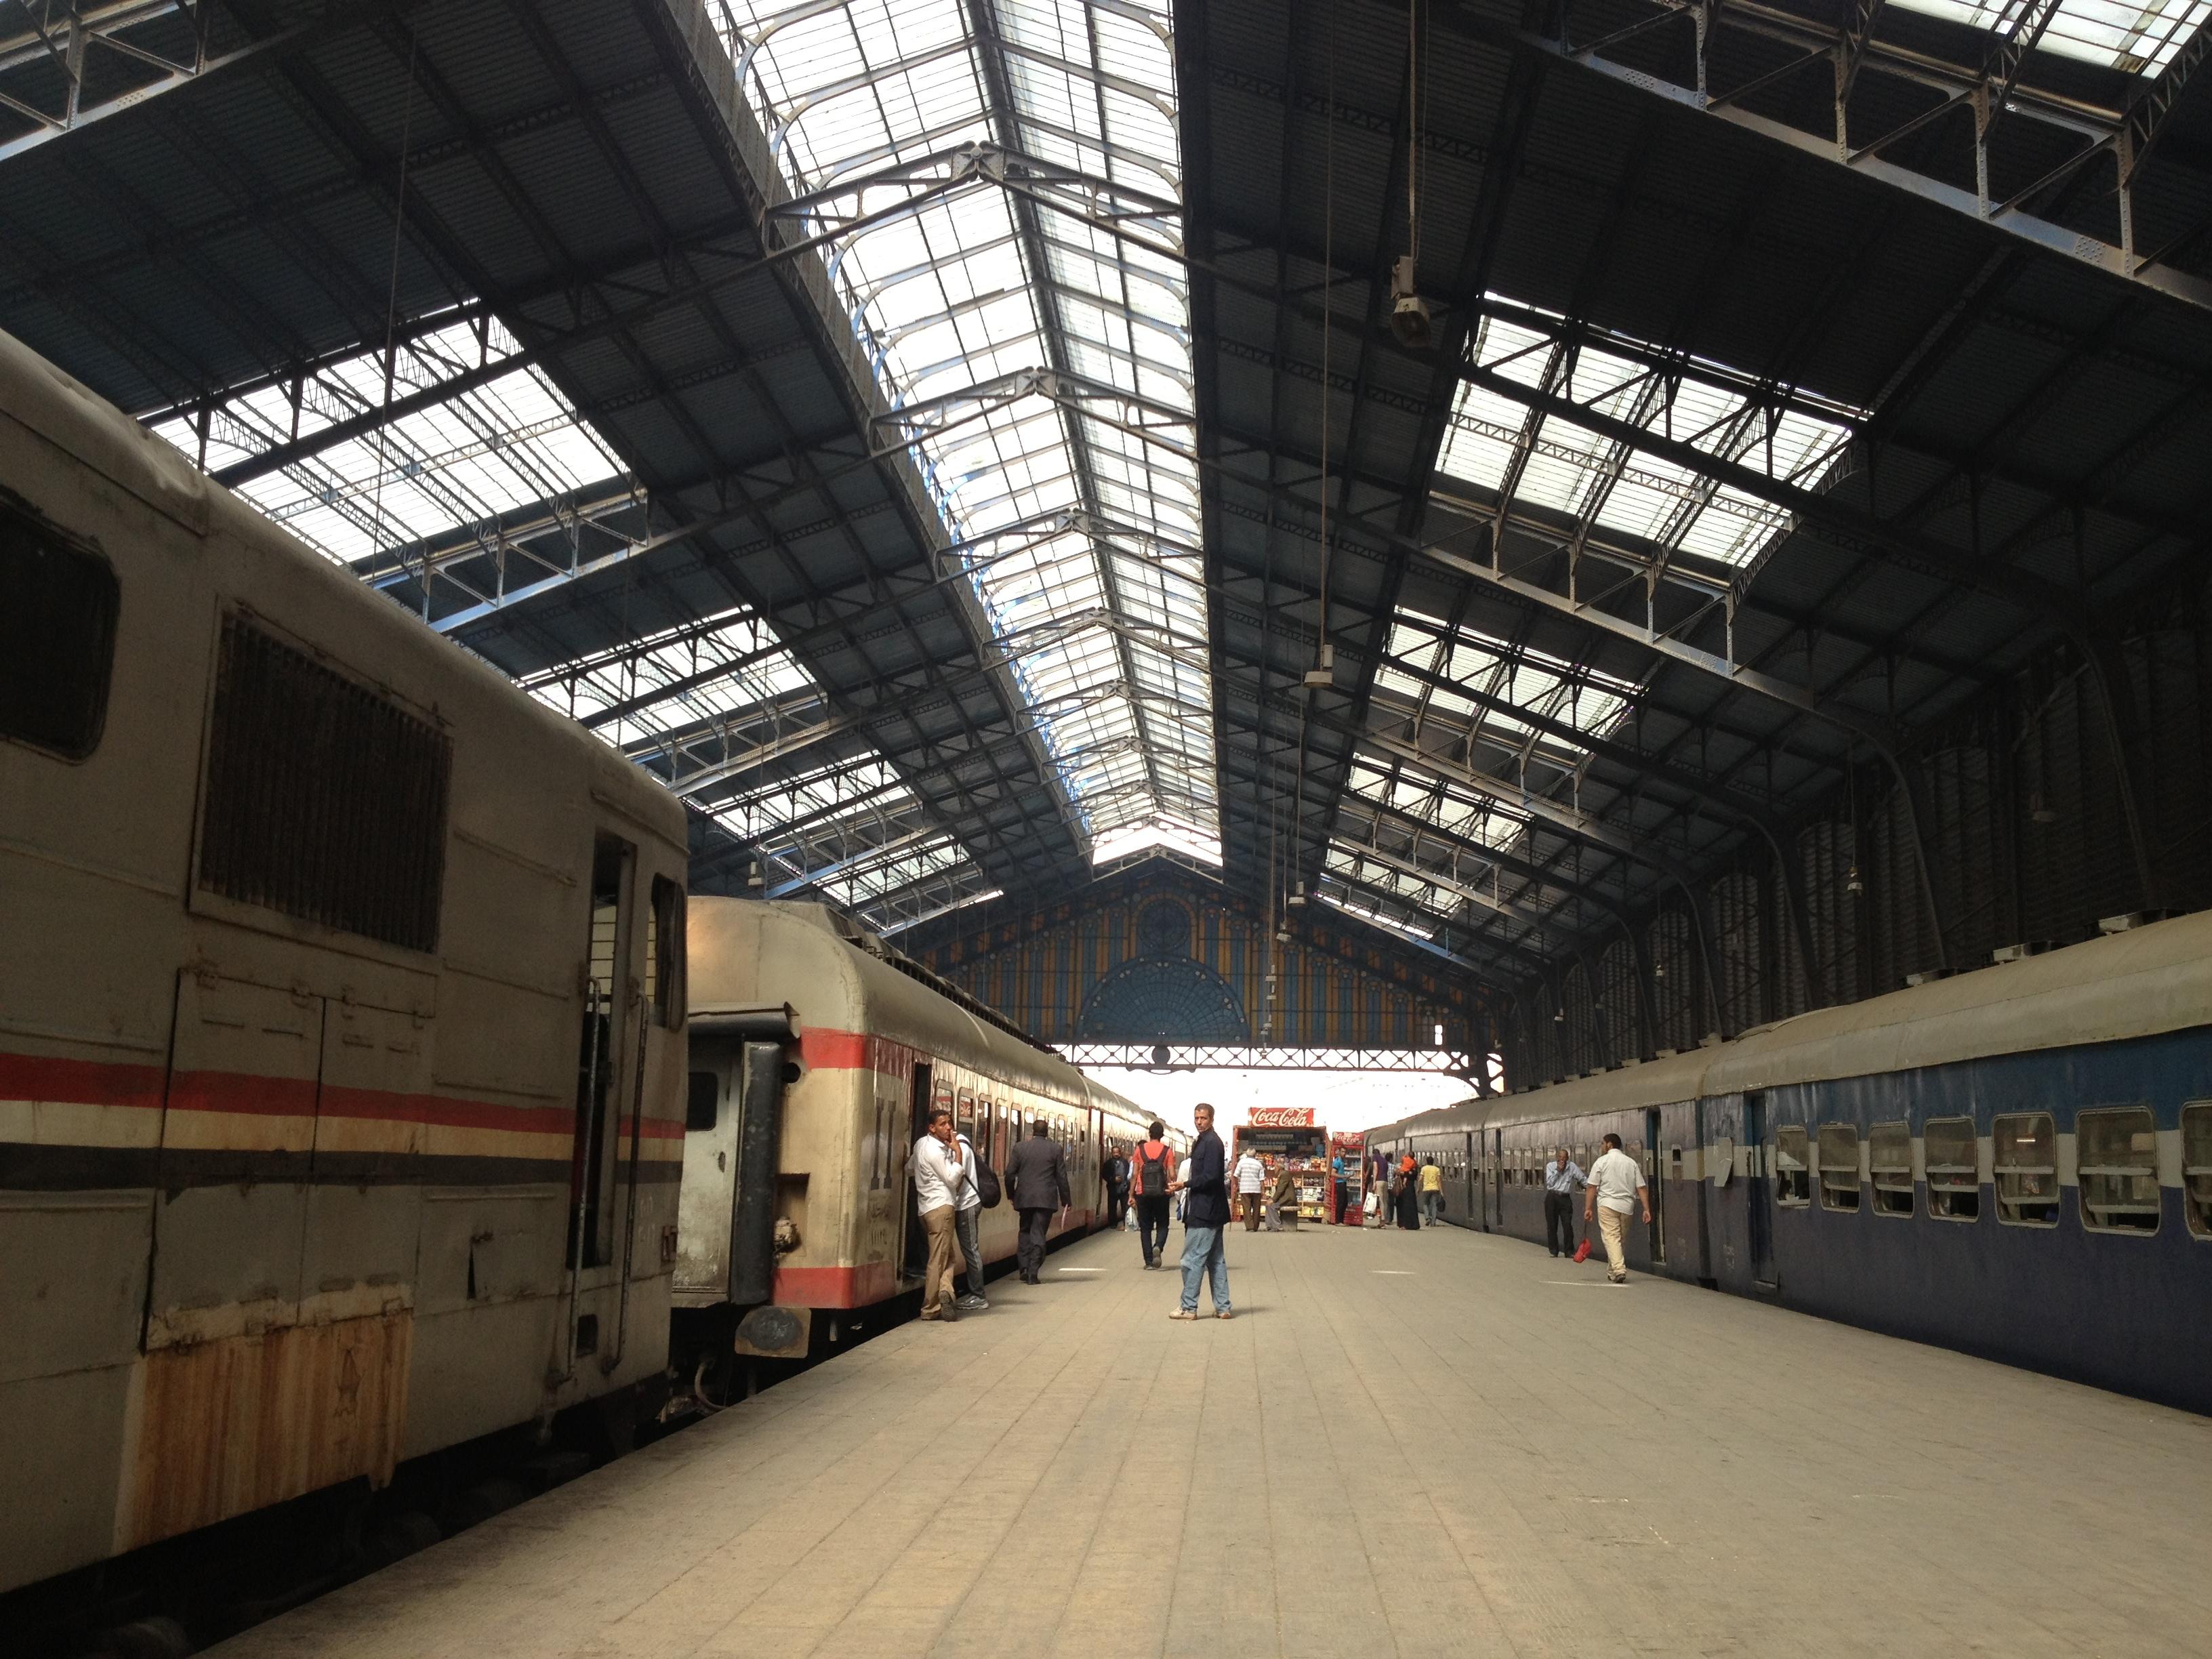 Misr_Station,_Alexandria,_Egypt